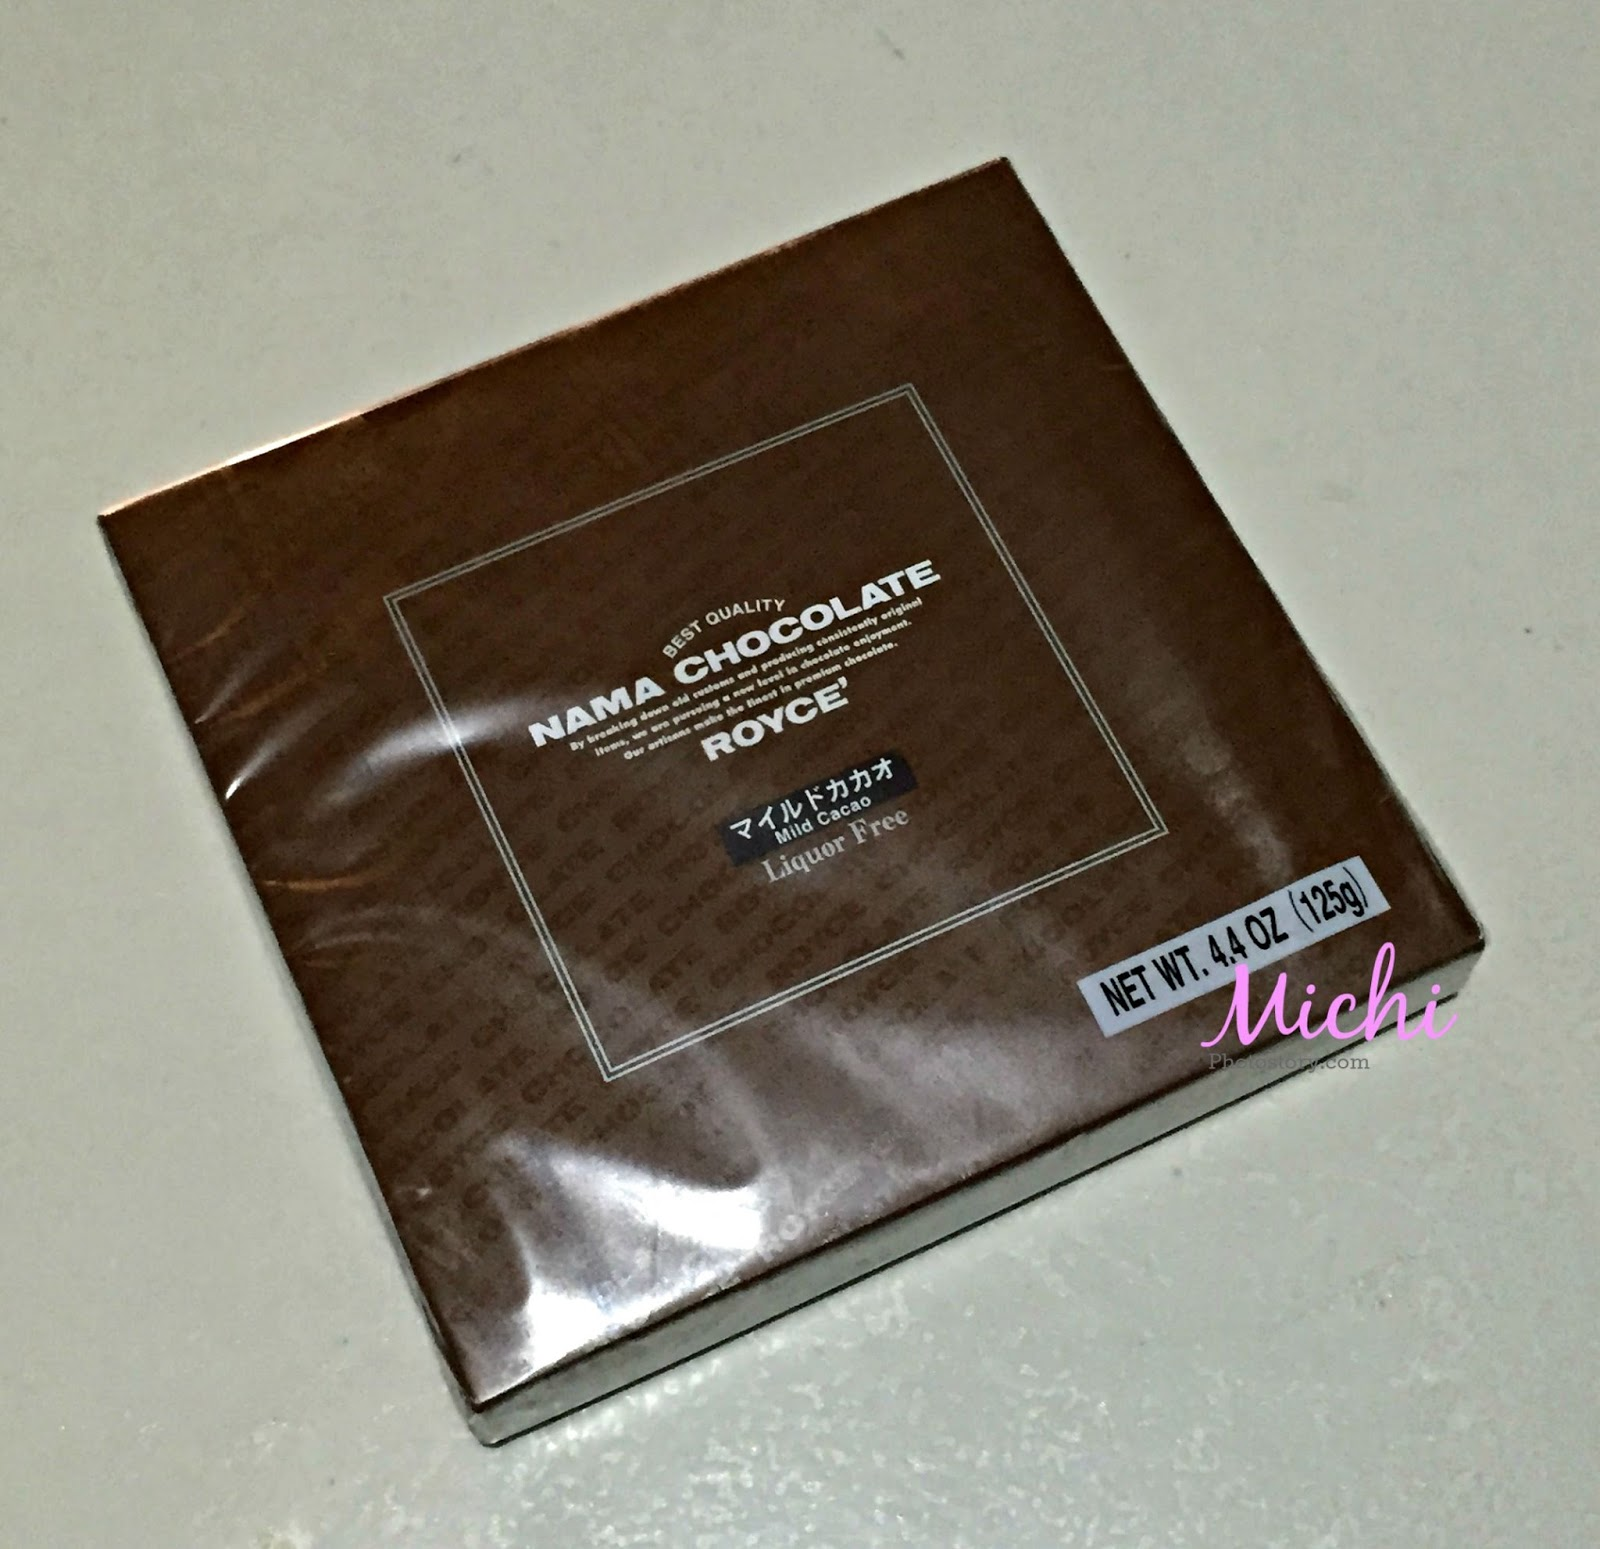 Michi Photostory: Royce Nama Chocolate